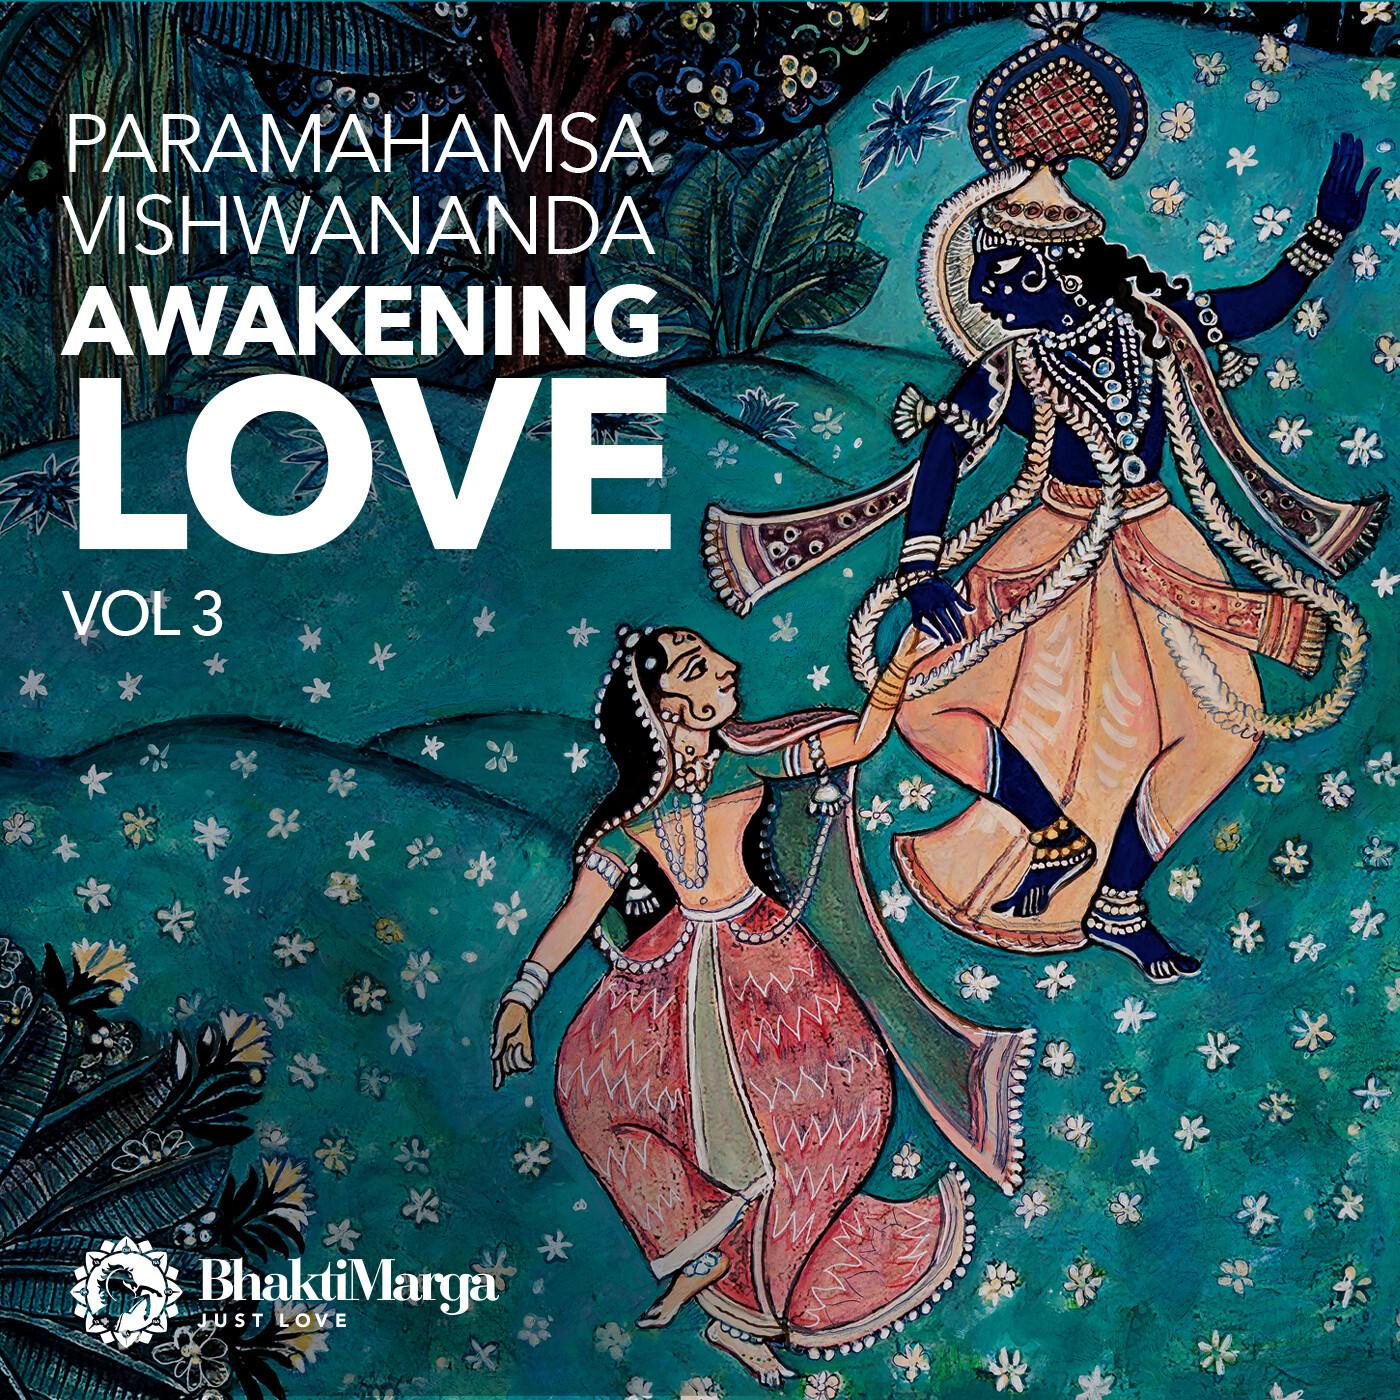 Awakening Love Vol.3 - Paramahamsa Vishwananda